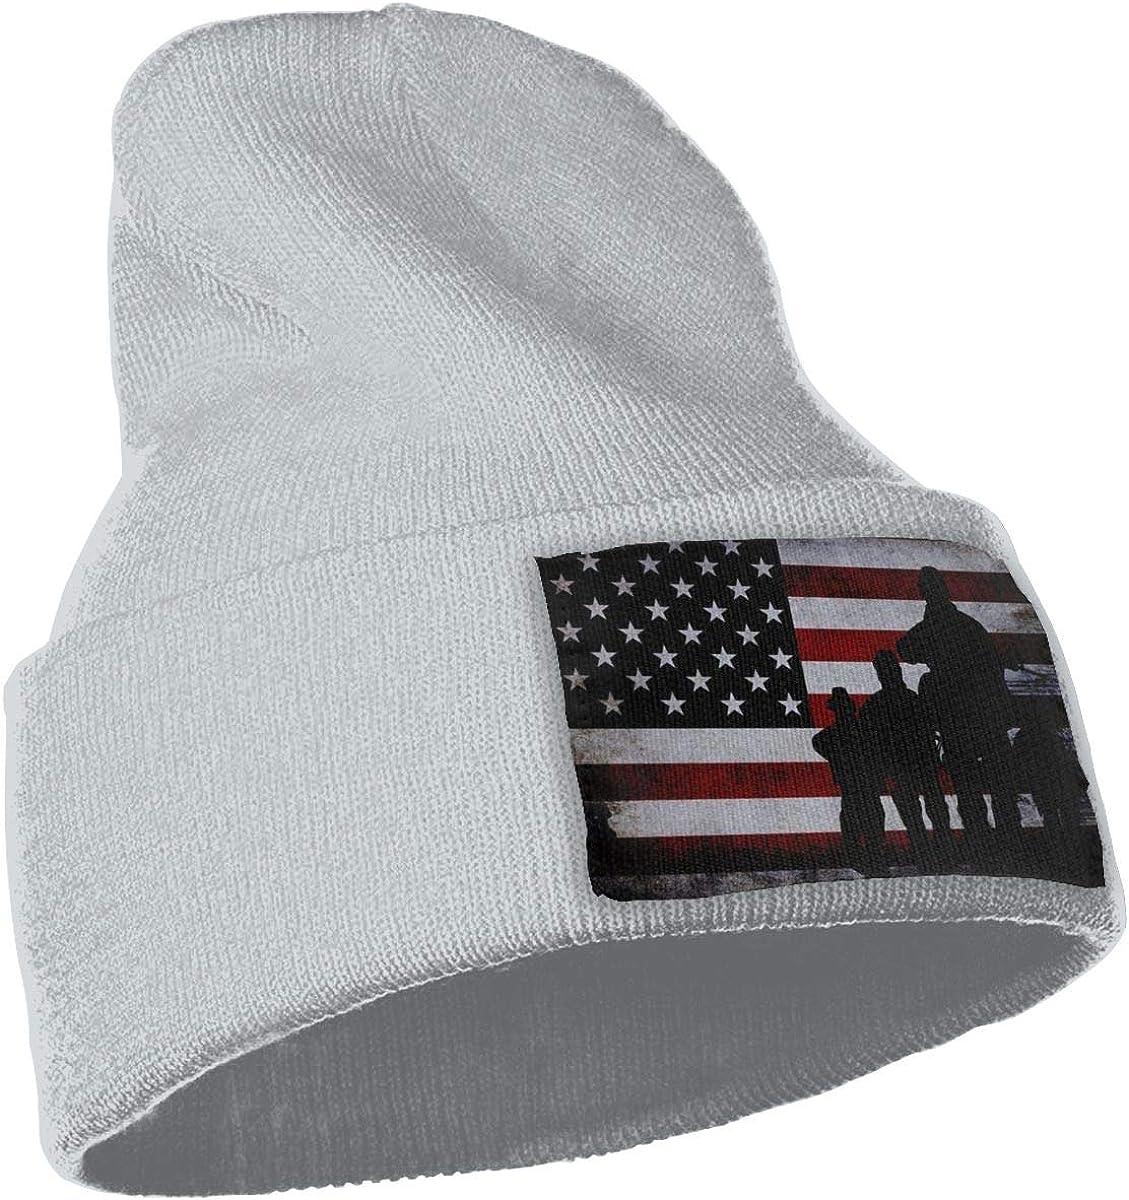 American Flag Veterans Day Army Ski Cap Men Women Knitting Hats Stretchy /& Soft Beanie